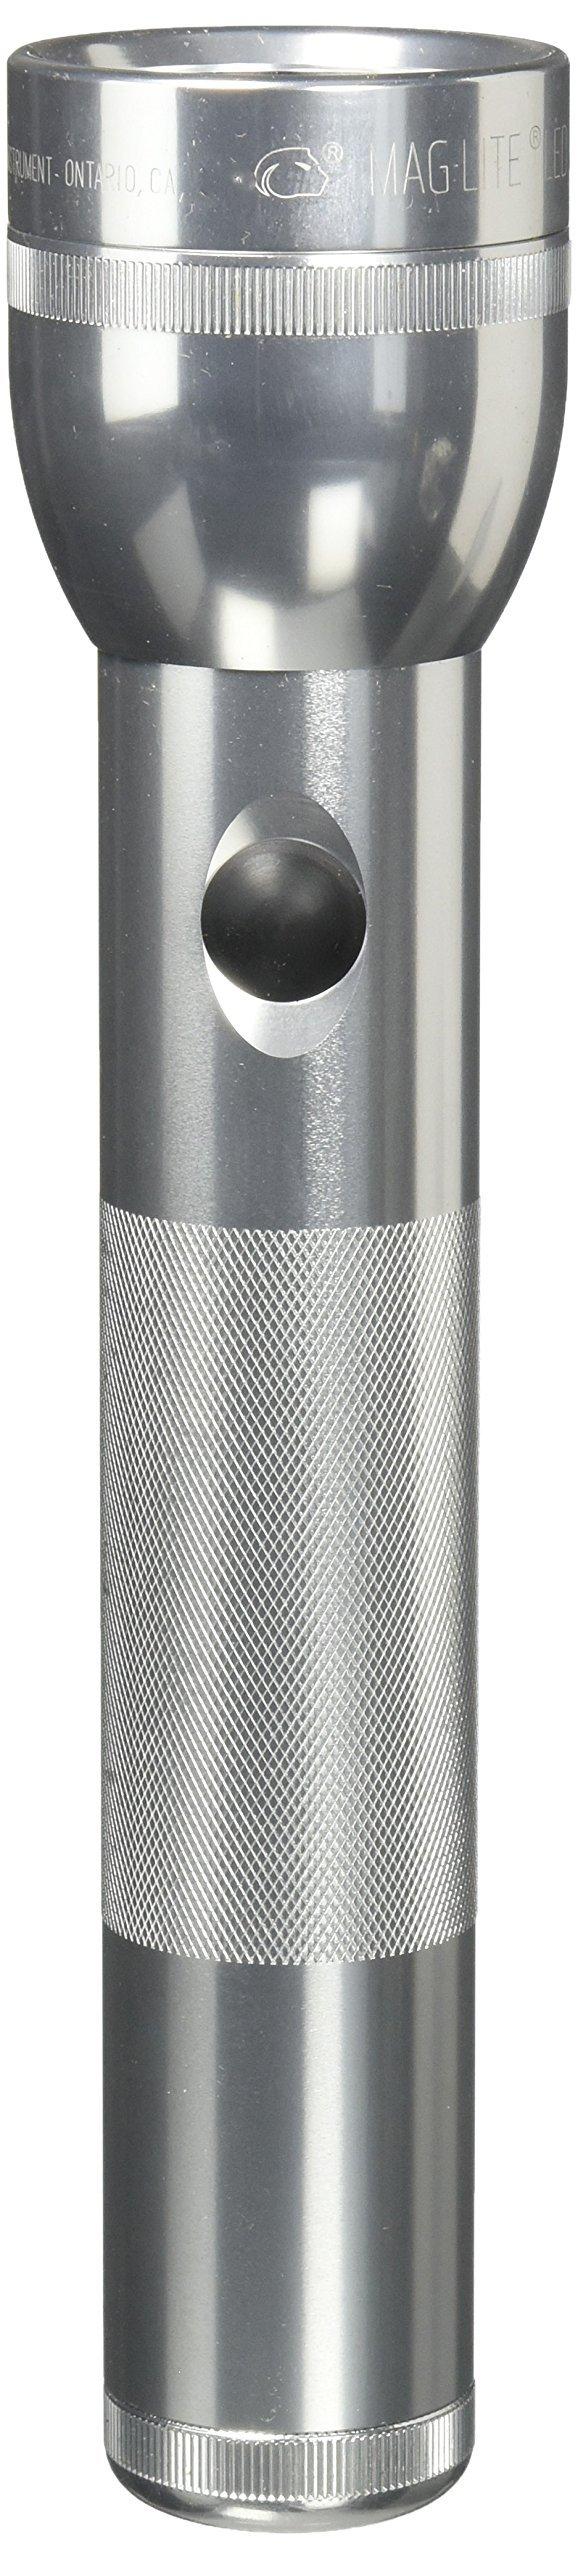 Linterna Maglite : LED 2-Celdas D en Display Box Silver